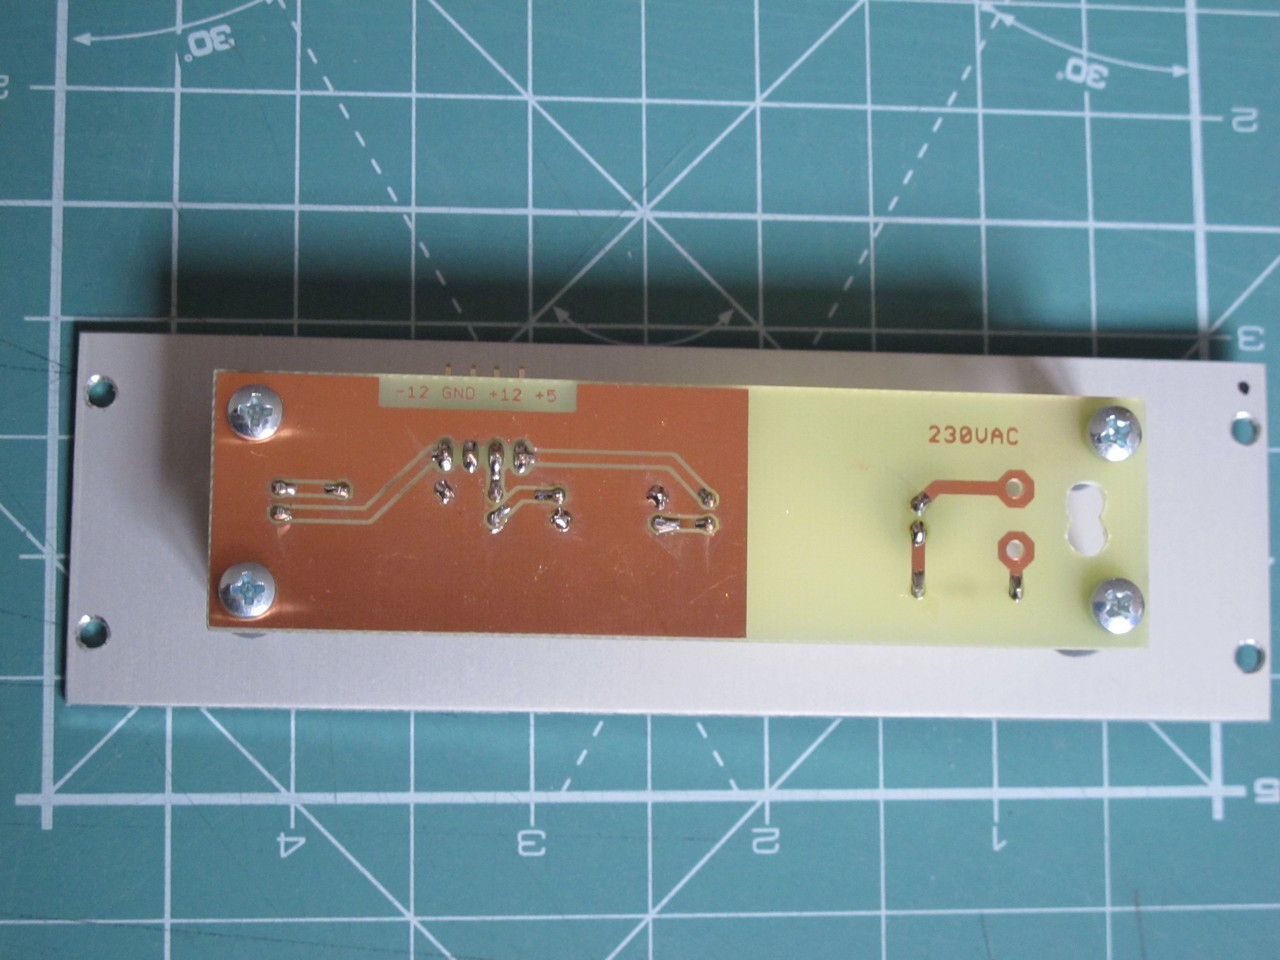 Tetsuo eurorack power supply indicator, back shot